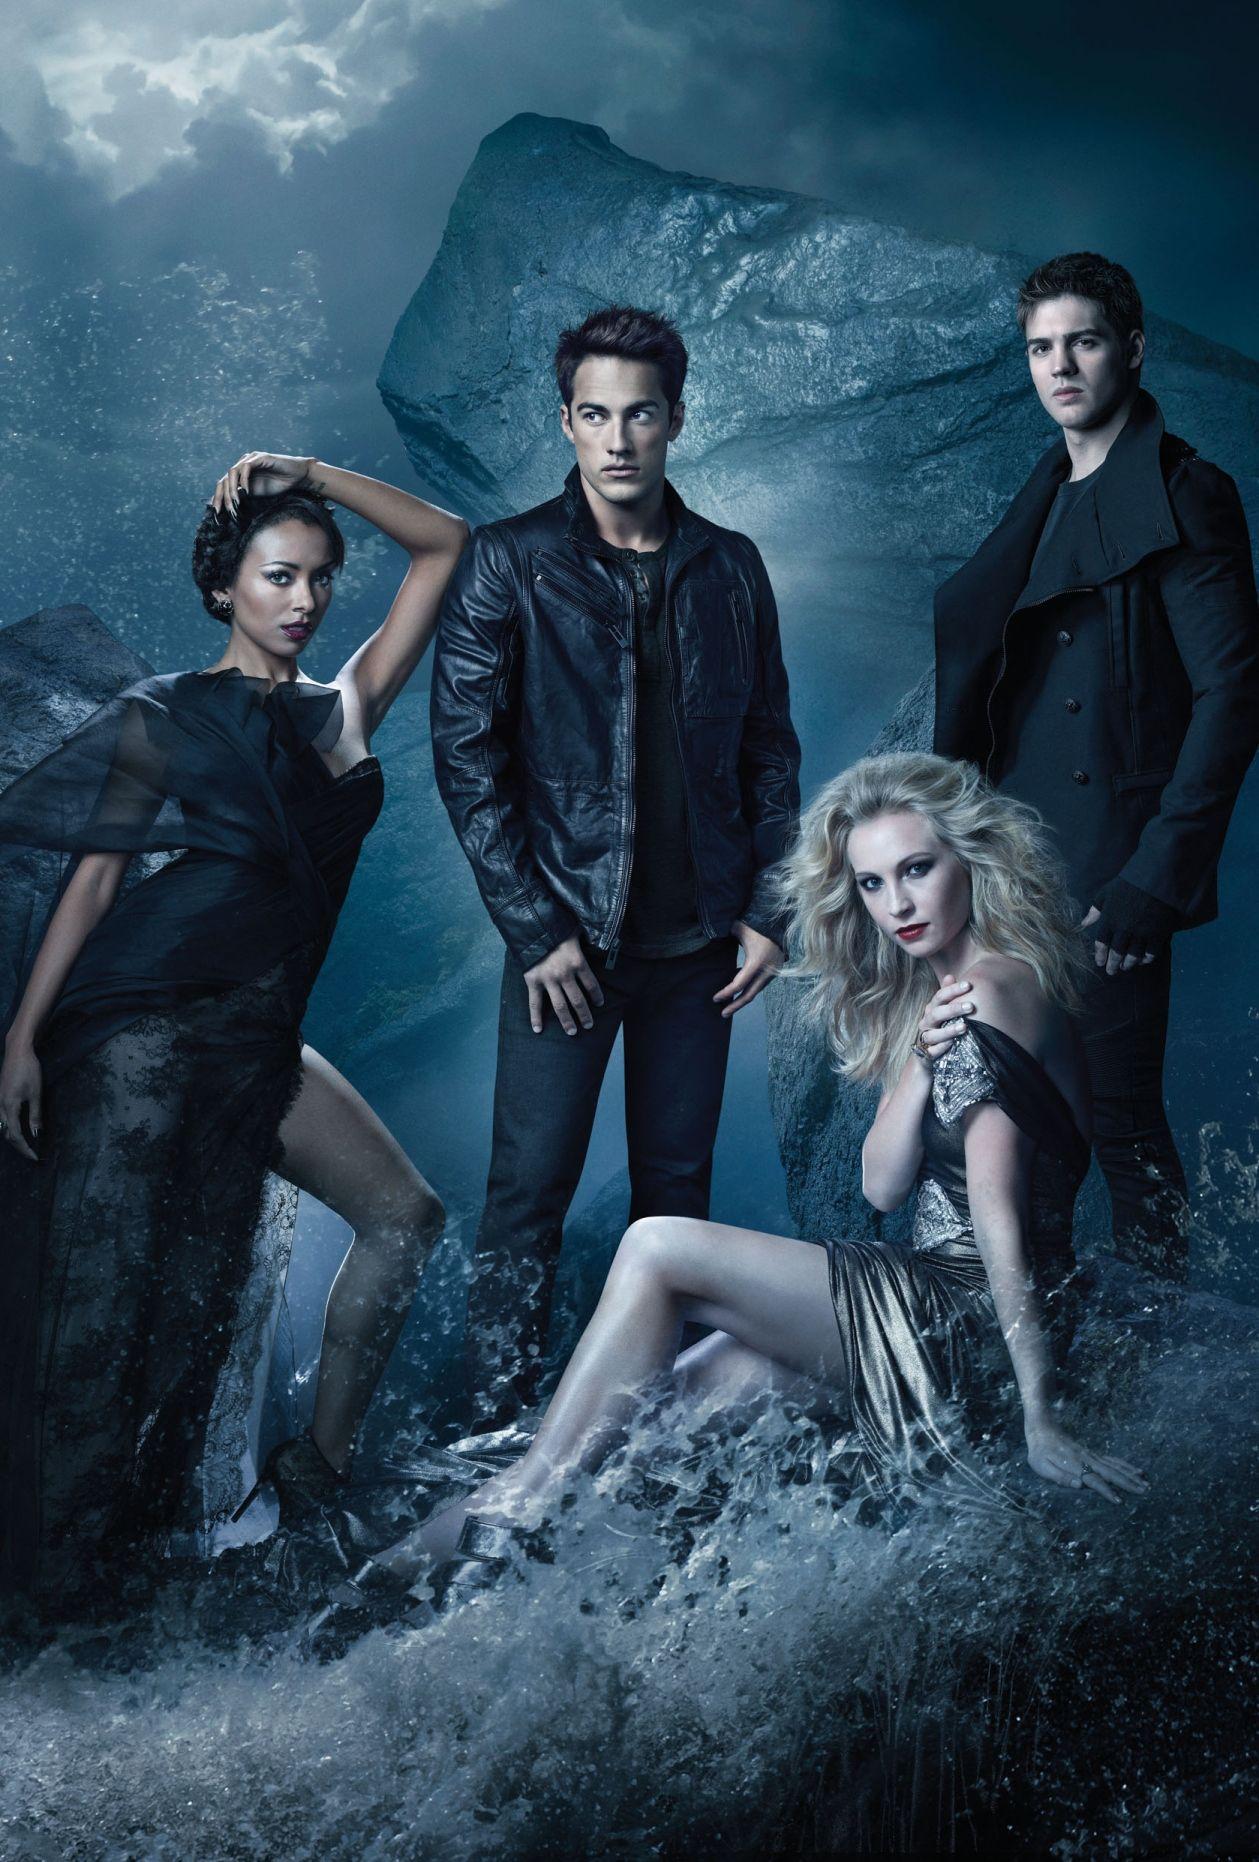 The Vampire Diaries Poster Vampire Diaries Poster